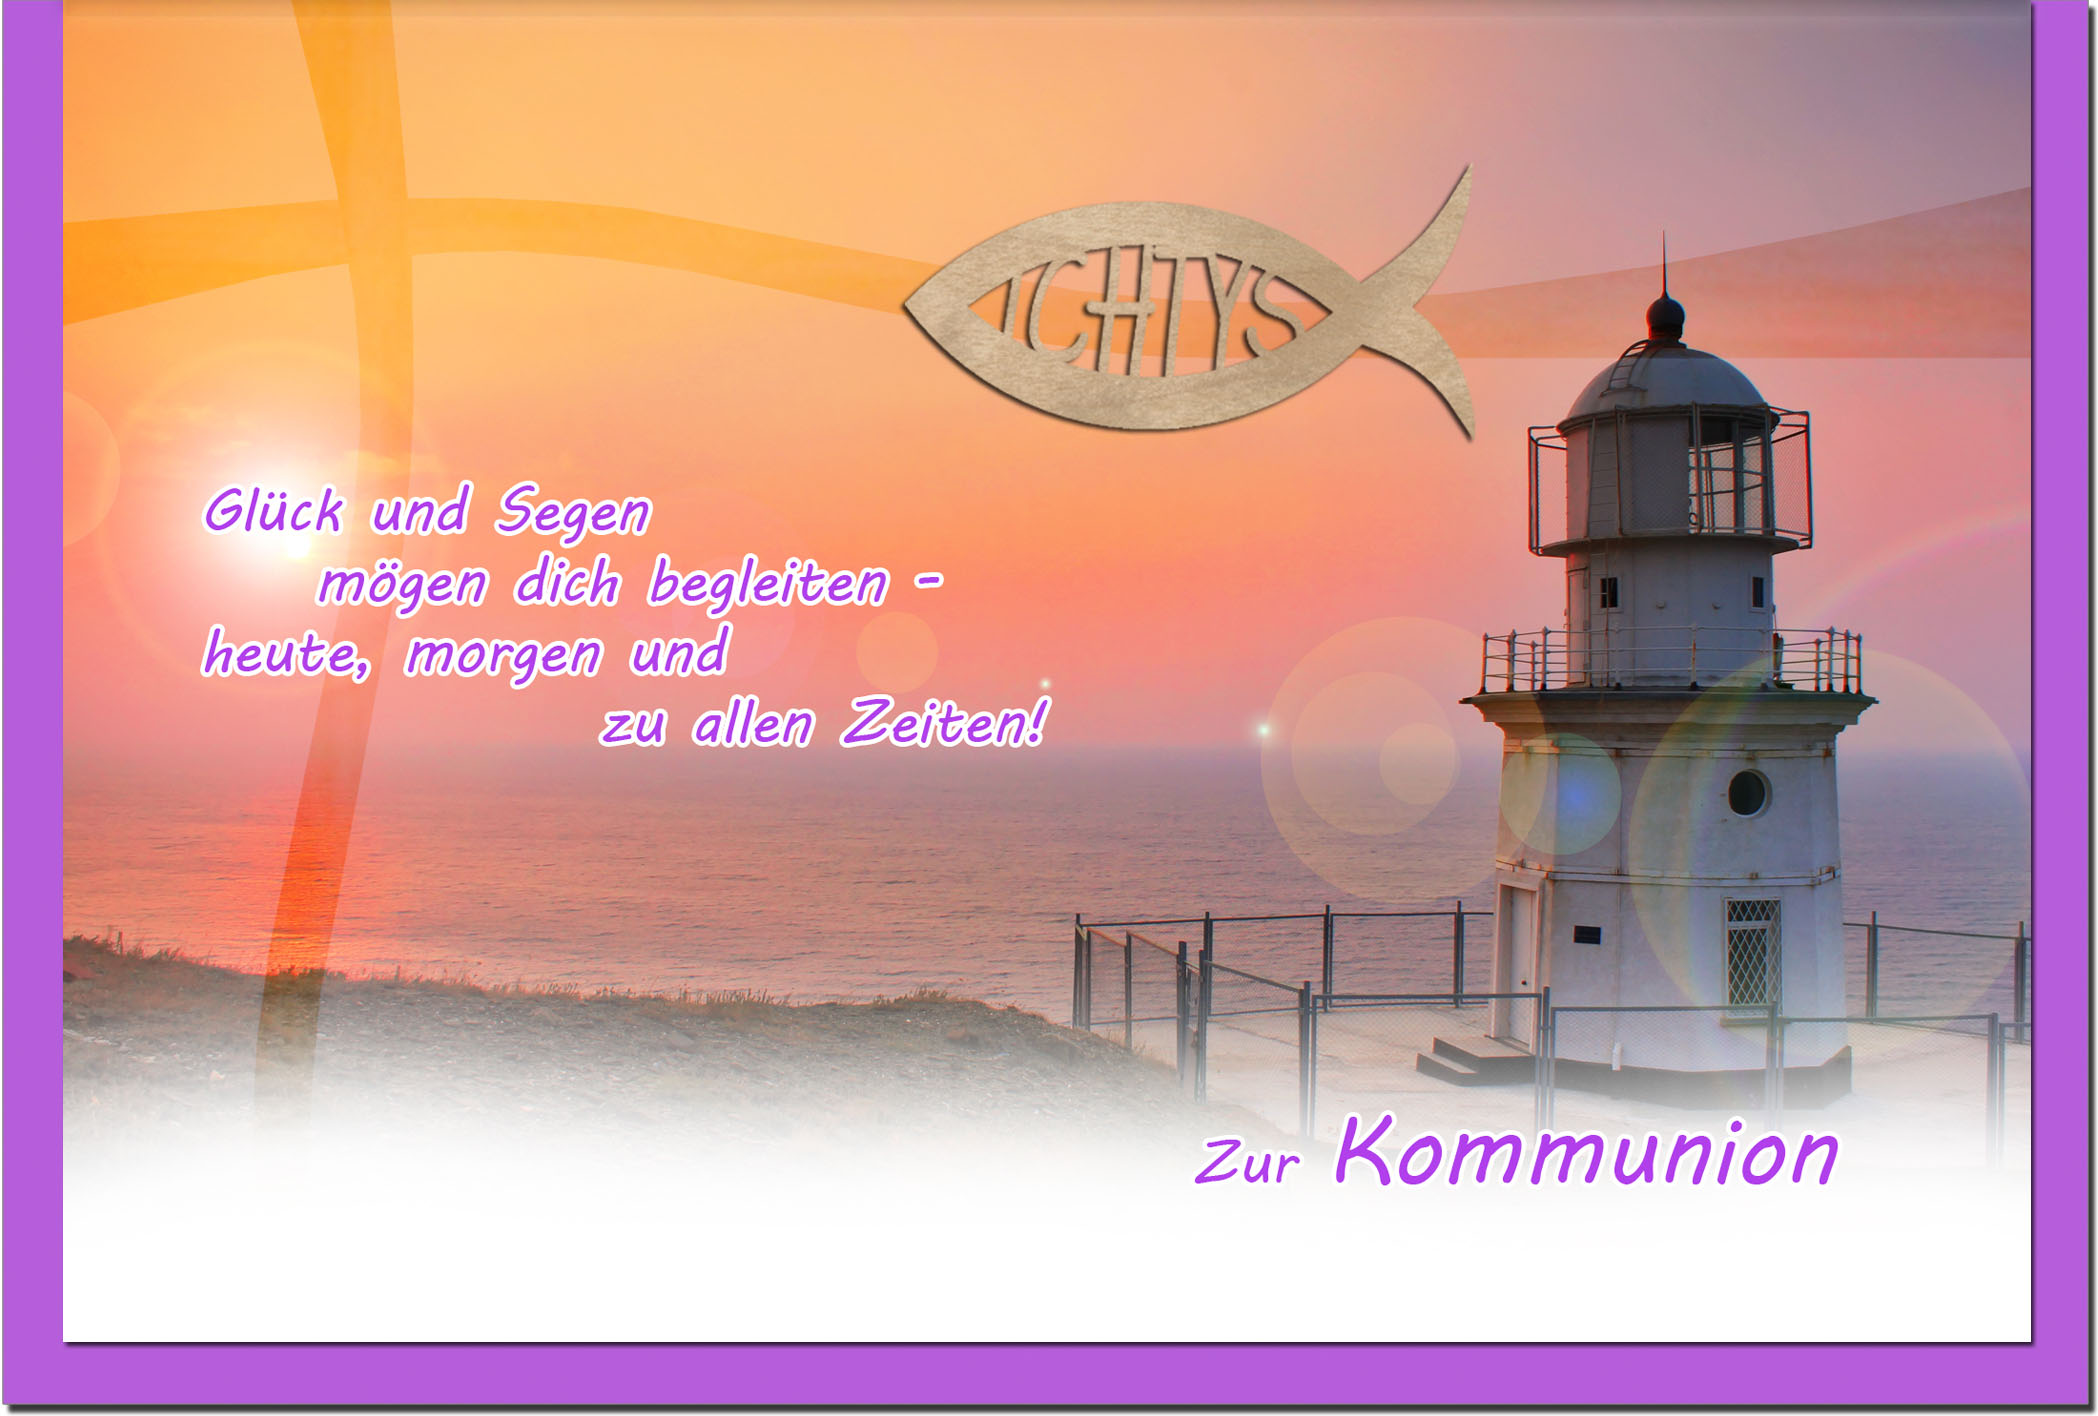 Kommunionskarten / Grußkarten / Glückwunschkarten /Kommunion Leuchtturm